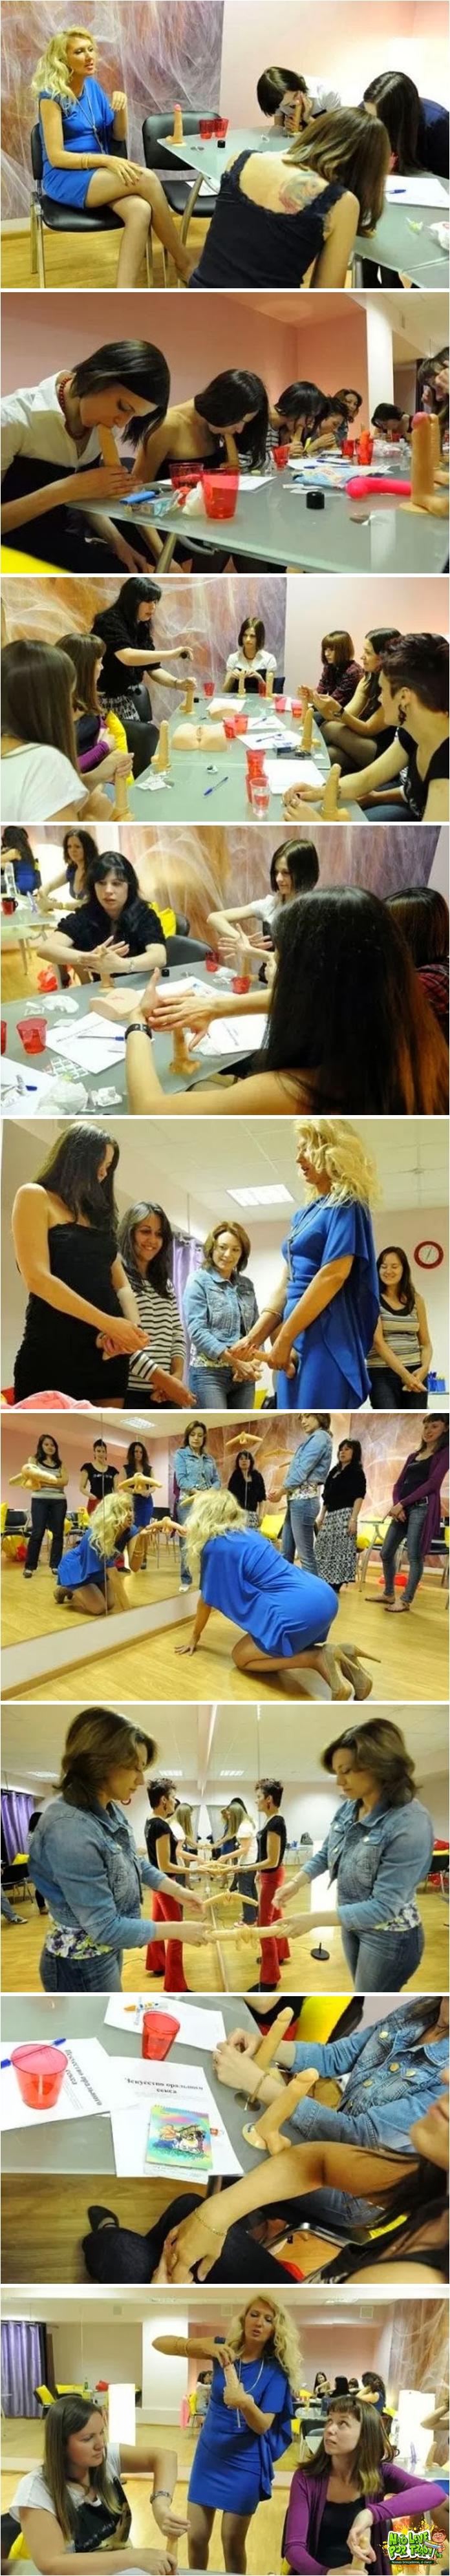 Brasil voluntario treinamento online dating 9